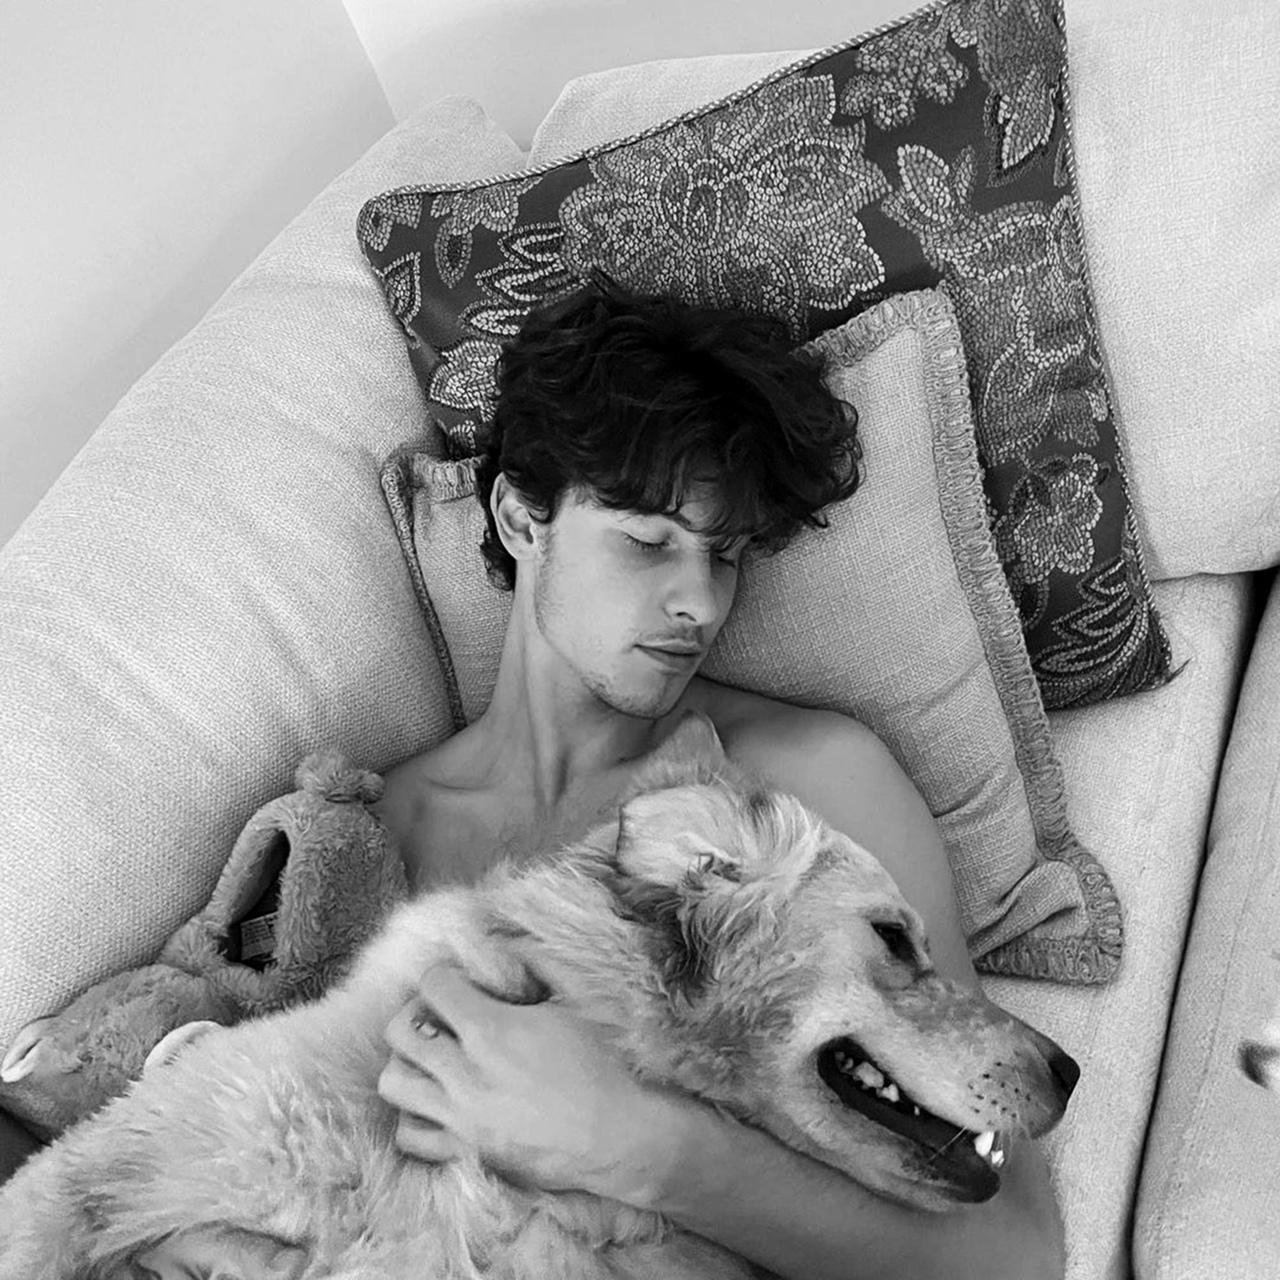 фото из альбома Shawn Mendes №13